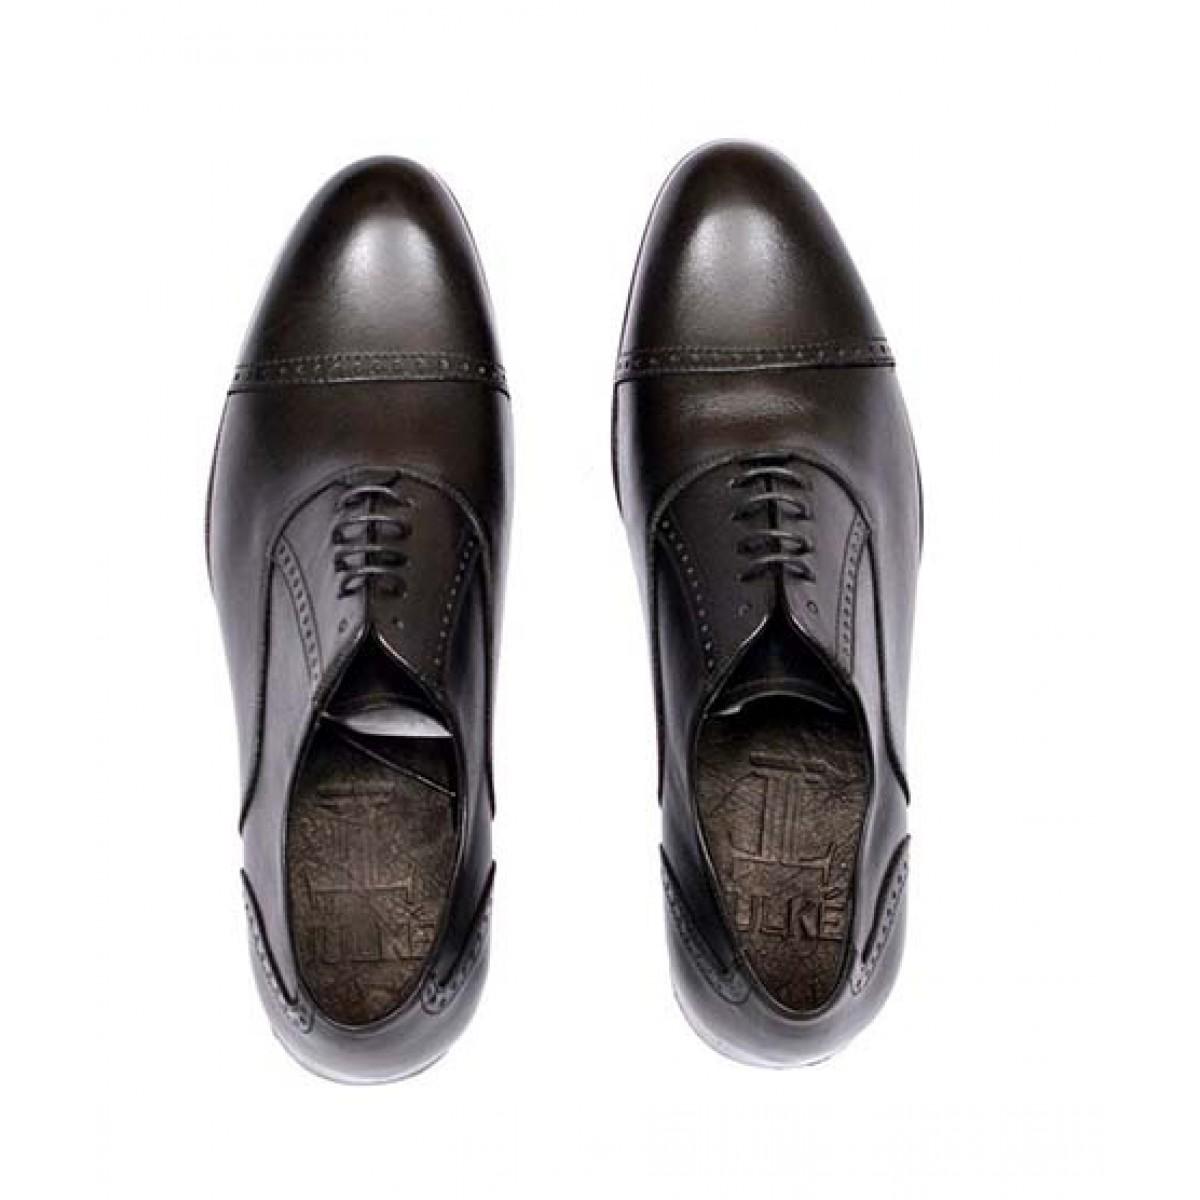 Julke Oxford Shoes For Men Black Price